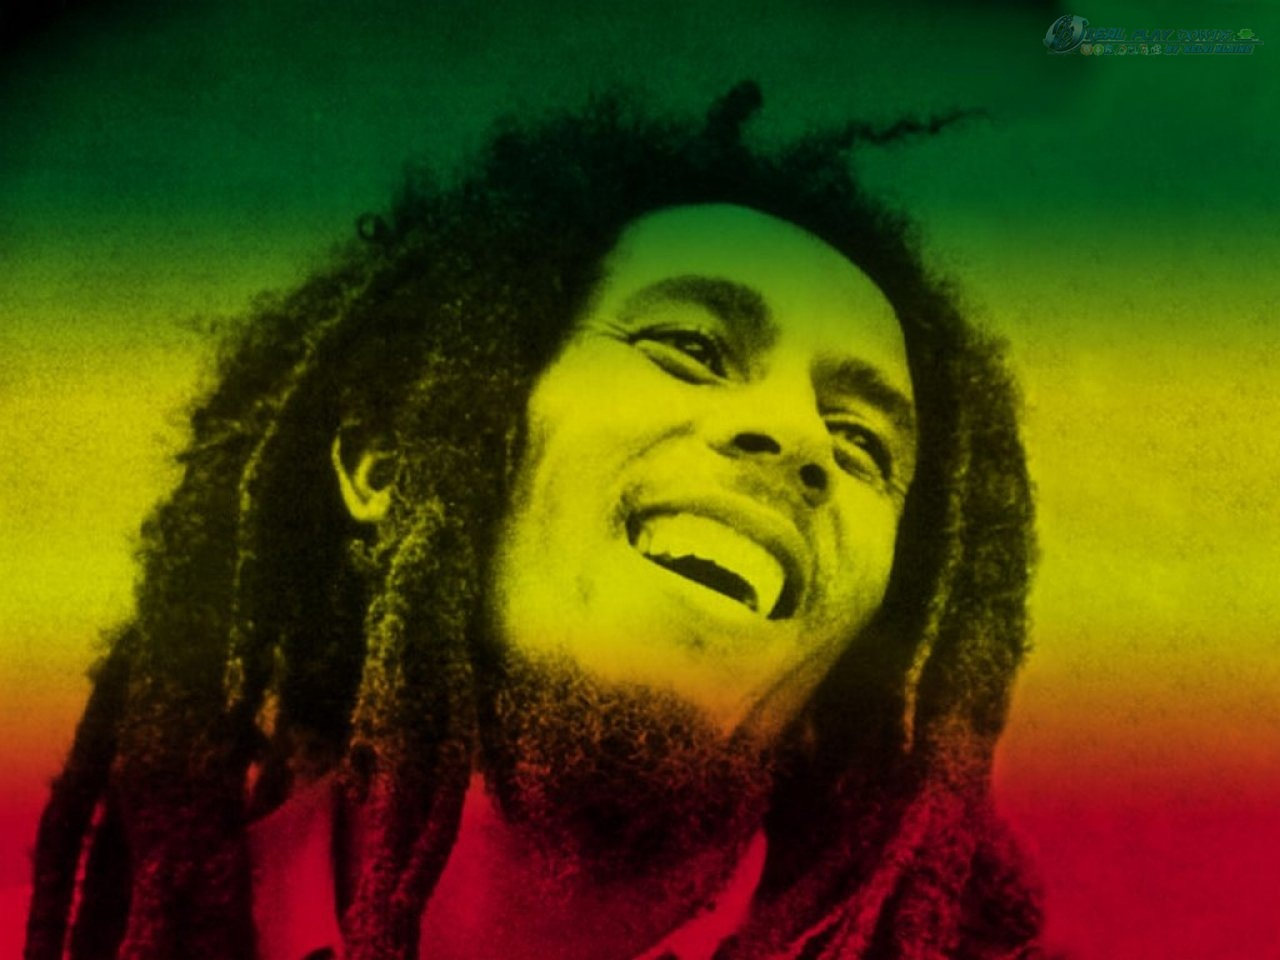 http://1.bp.blogspot.com/-qdHHC-DyPf0/Tcl8ieO8B-I/AAAAAAAACv8/u7T1ilpeOes/s1600/Bob_Marley_wallpaper_picture_image_free_music_Reggae_desktop_wallpaper_1280.jpg